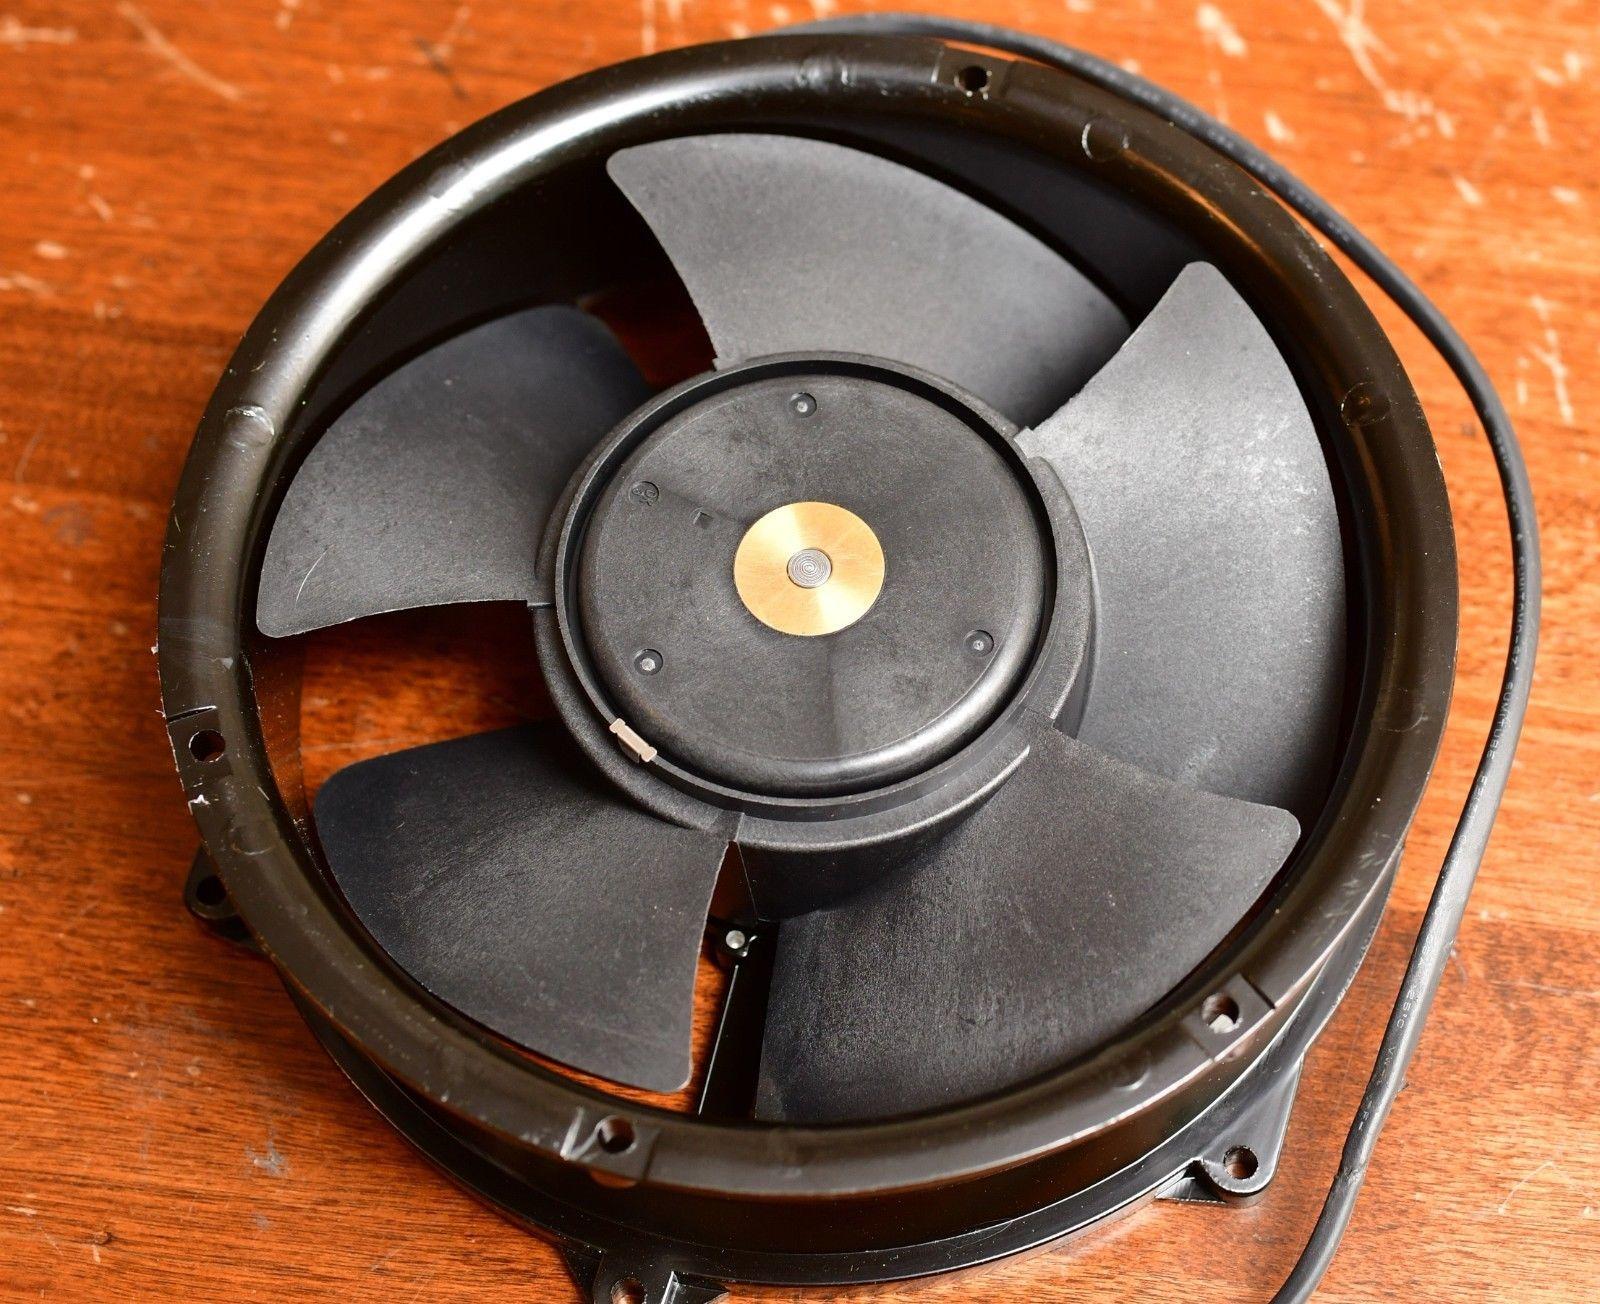 Nidec BKV 301 216/156  Y17L54BS1AA5-09E02 4800 RPM 54.5V DC fan